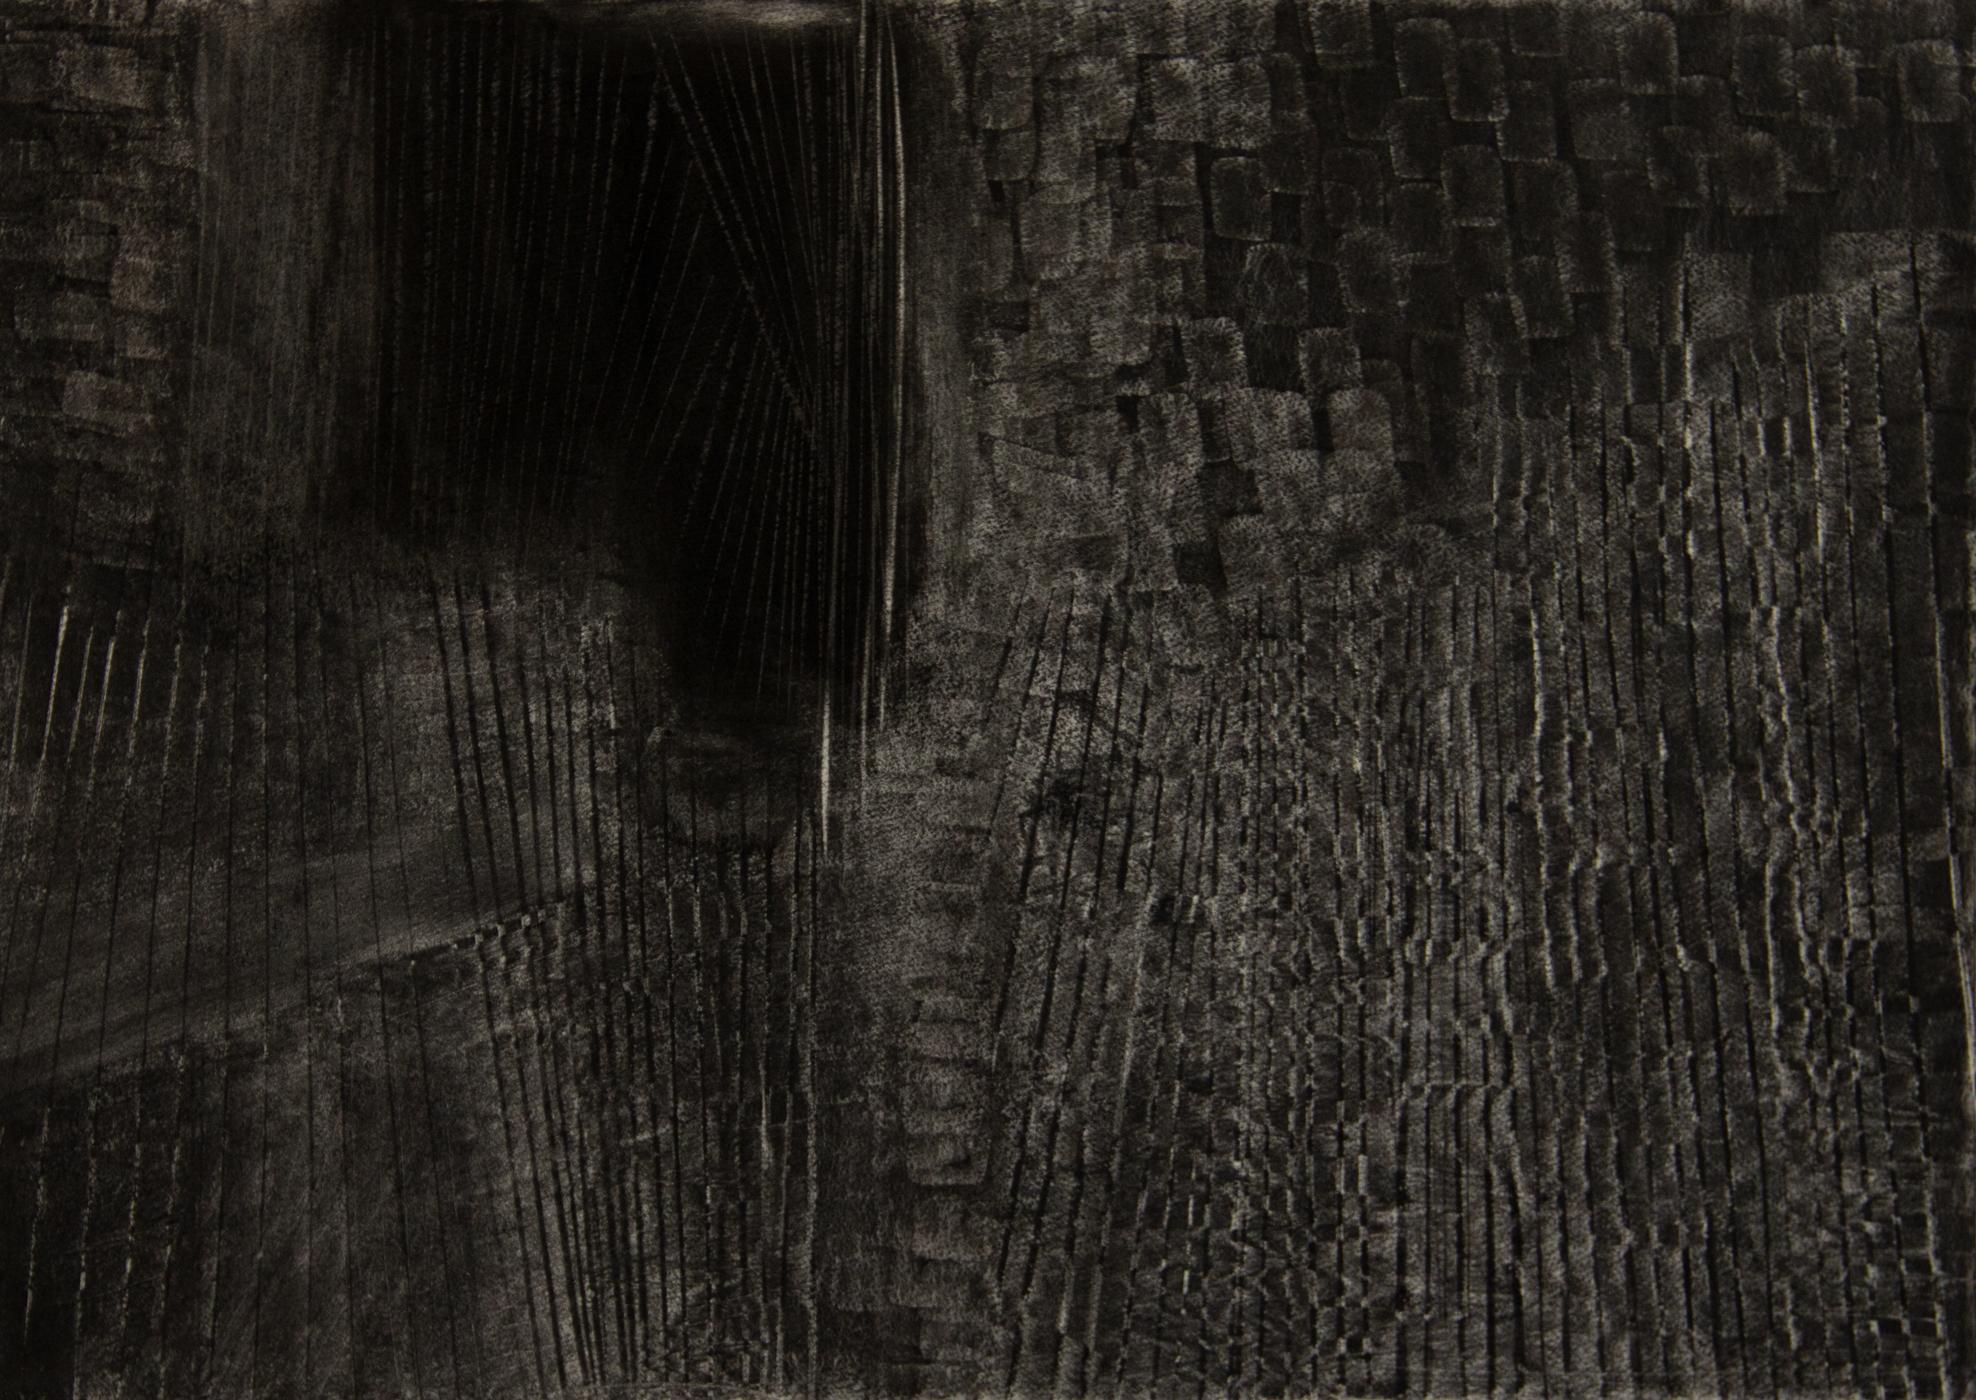 Untitled 08